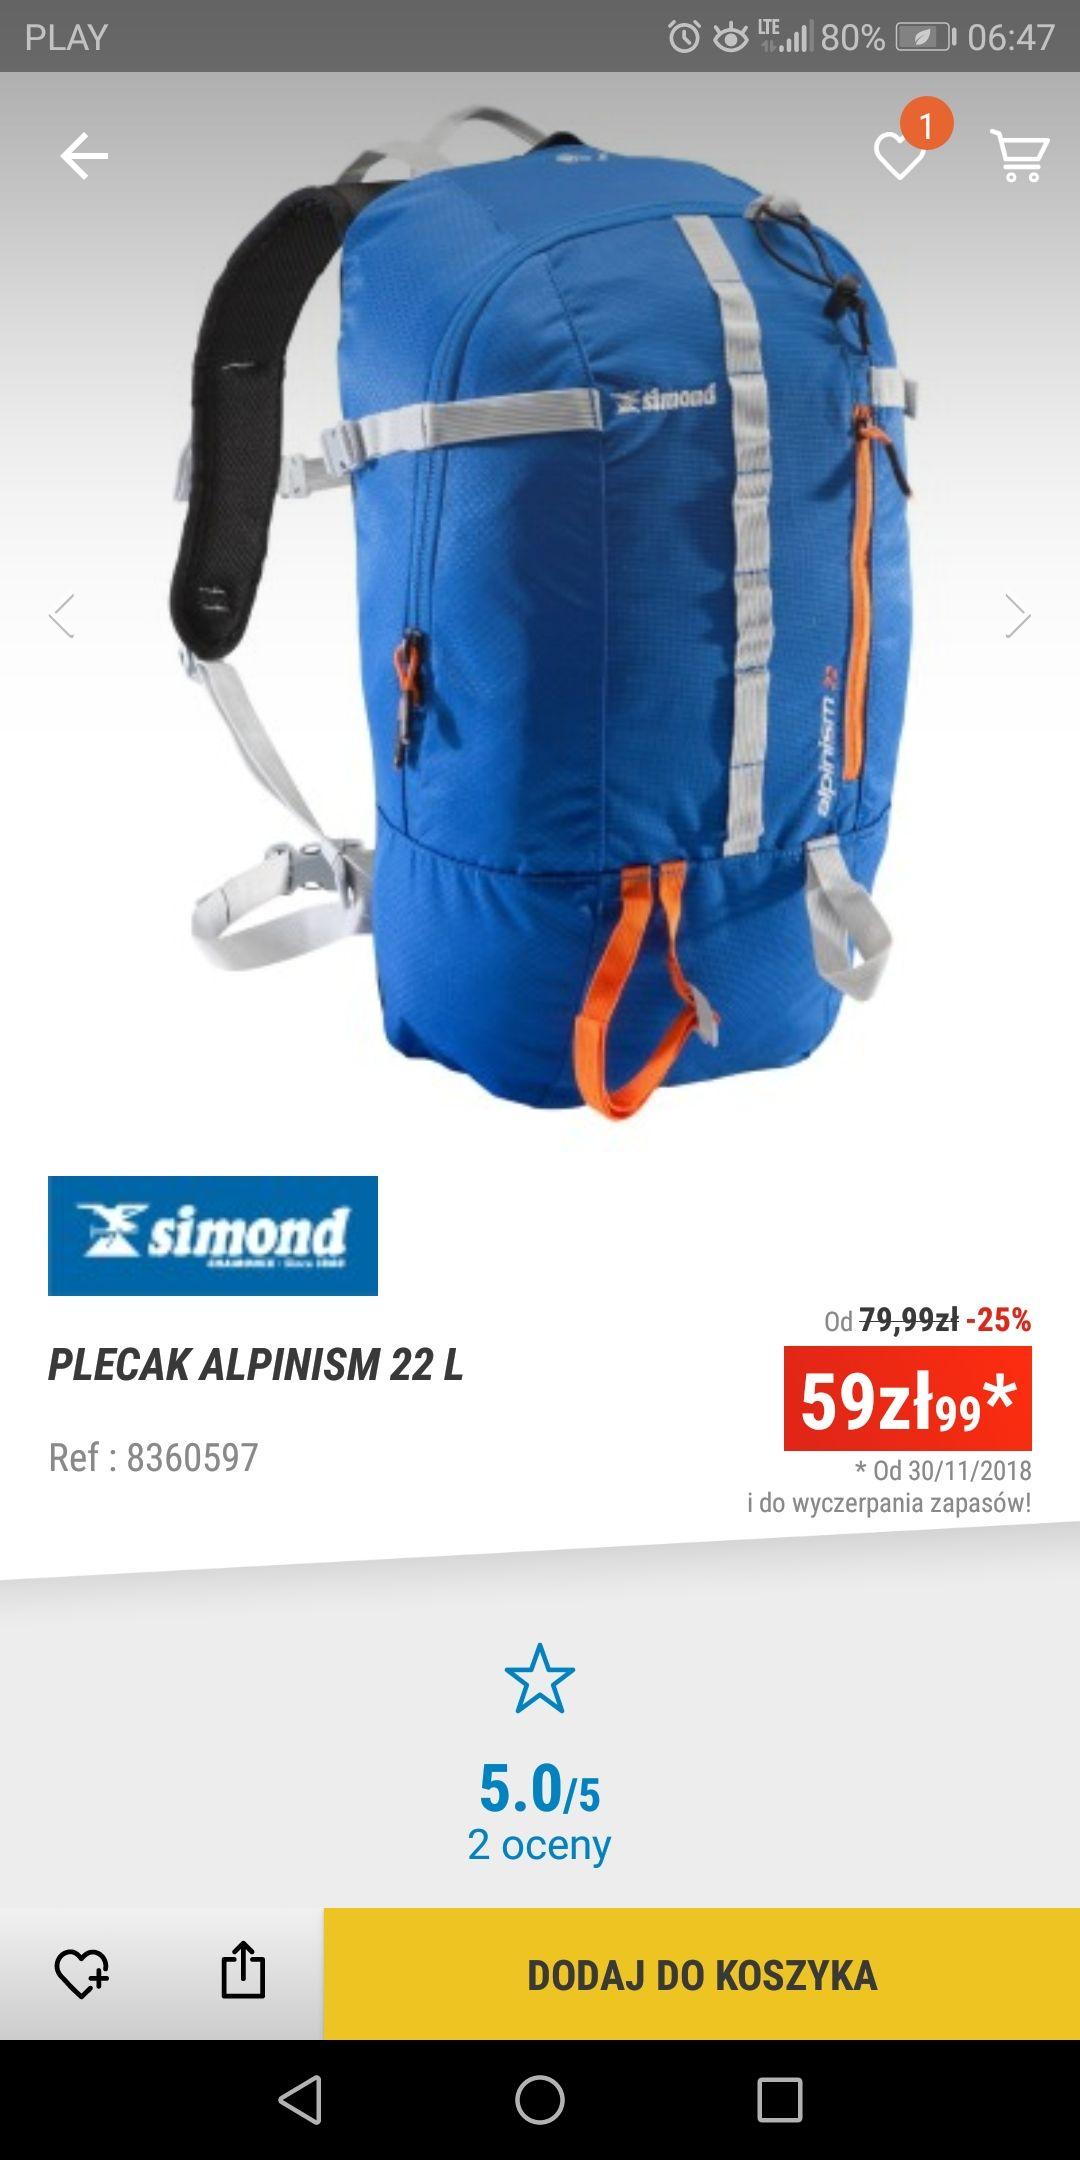 Plecak simond alpinism 22l